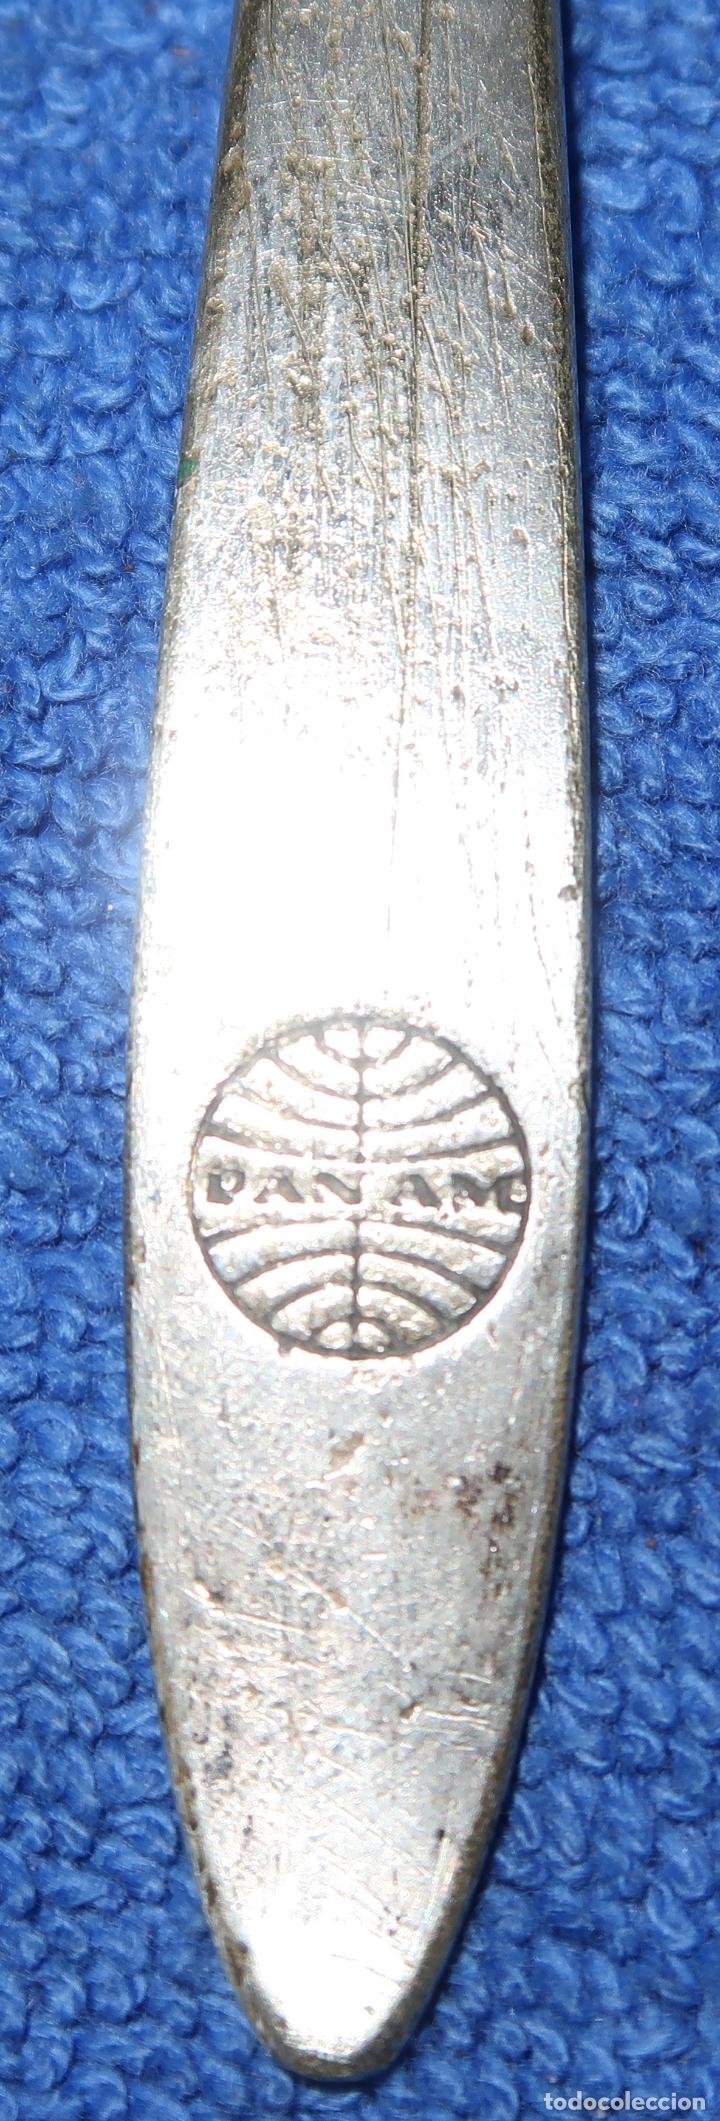 Militaria: Cucharas nazis - Cuchillos americanos - Segunda Guerra Mundial - Foto 4 - 179550683